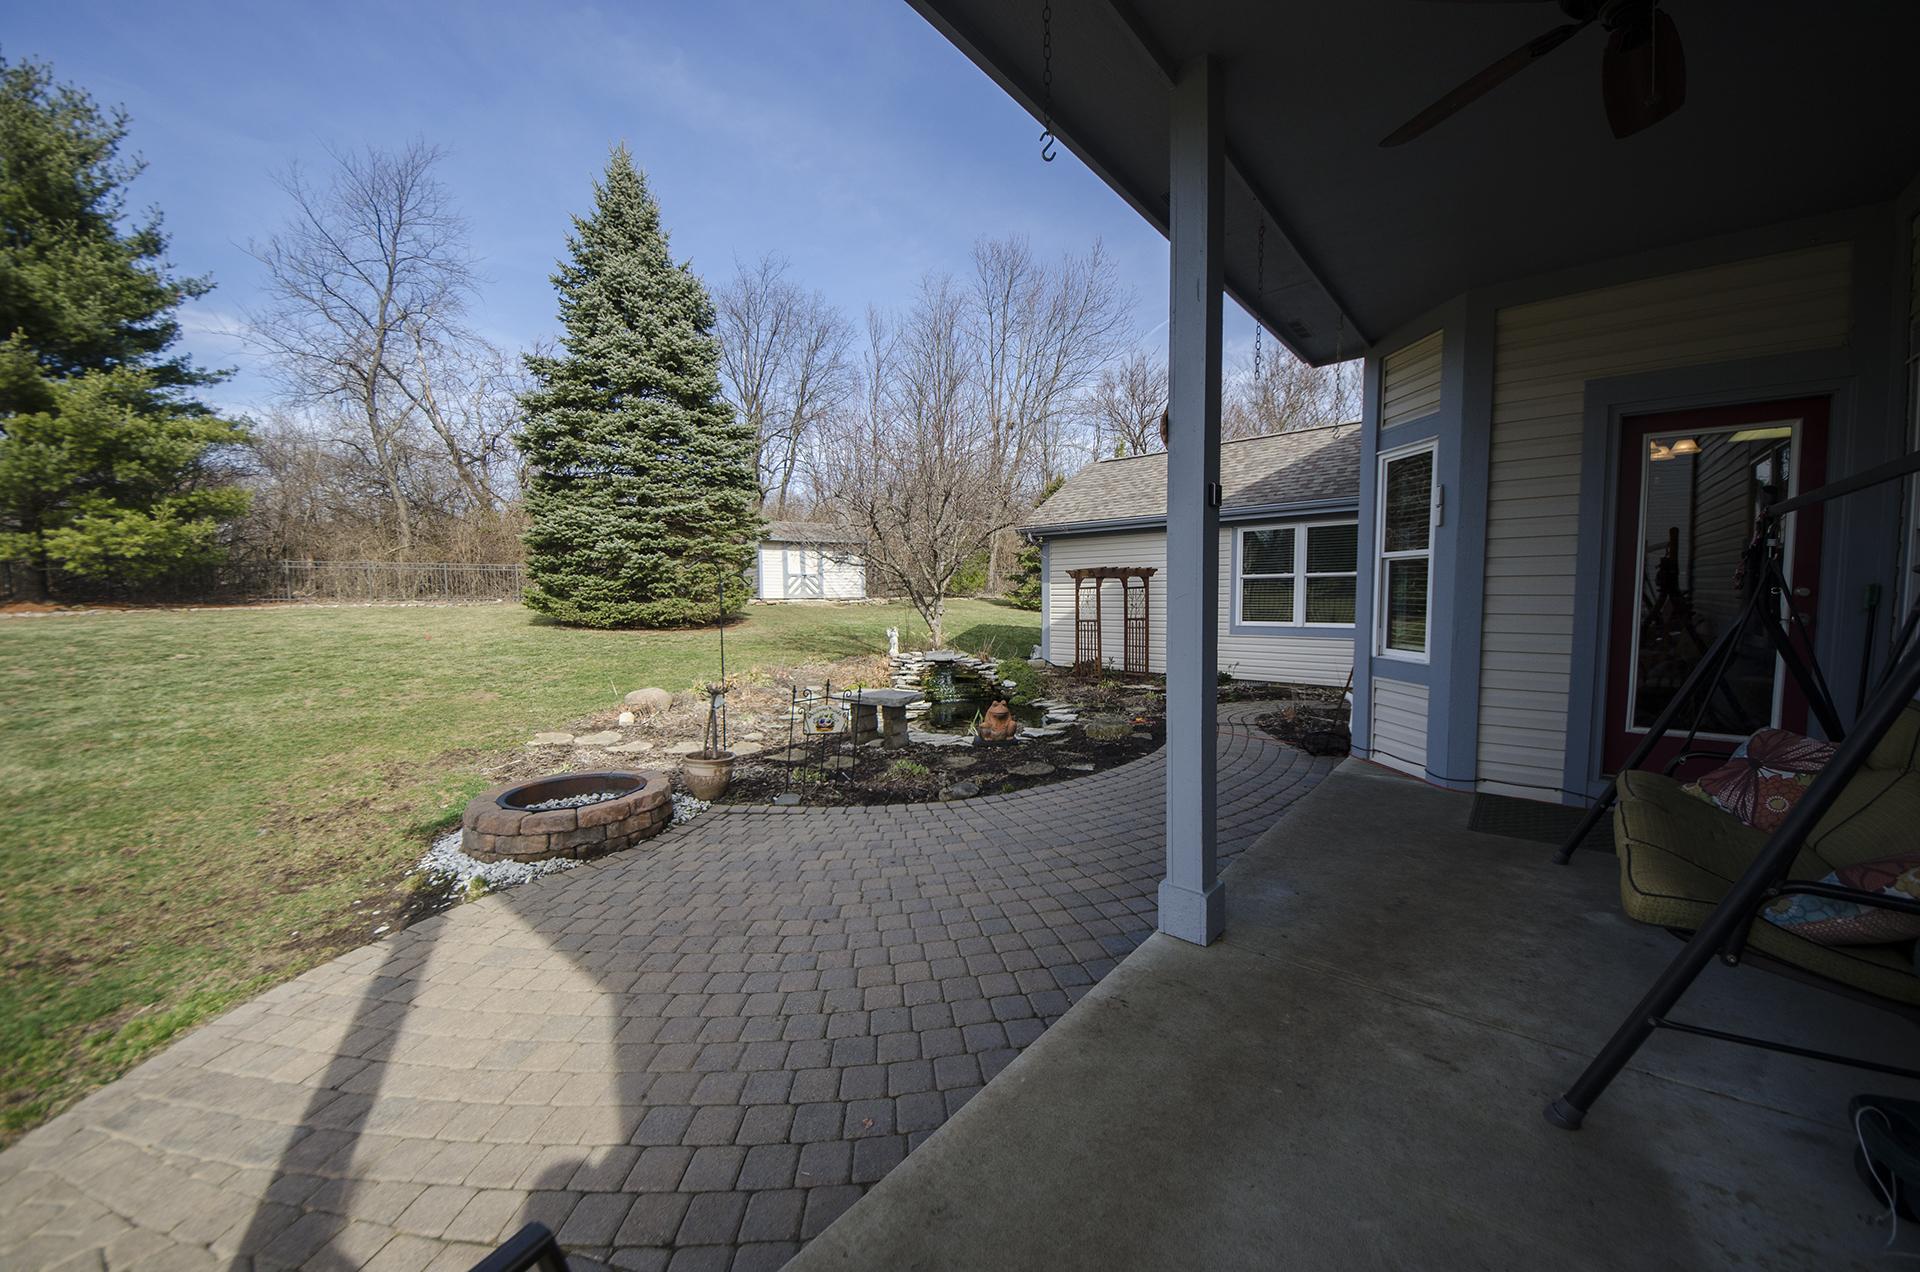 Awesome Design Homes Dayton Ohio Images - Interior Design Ideas ...